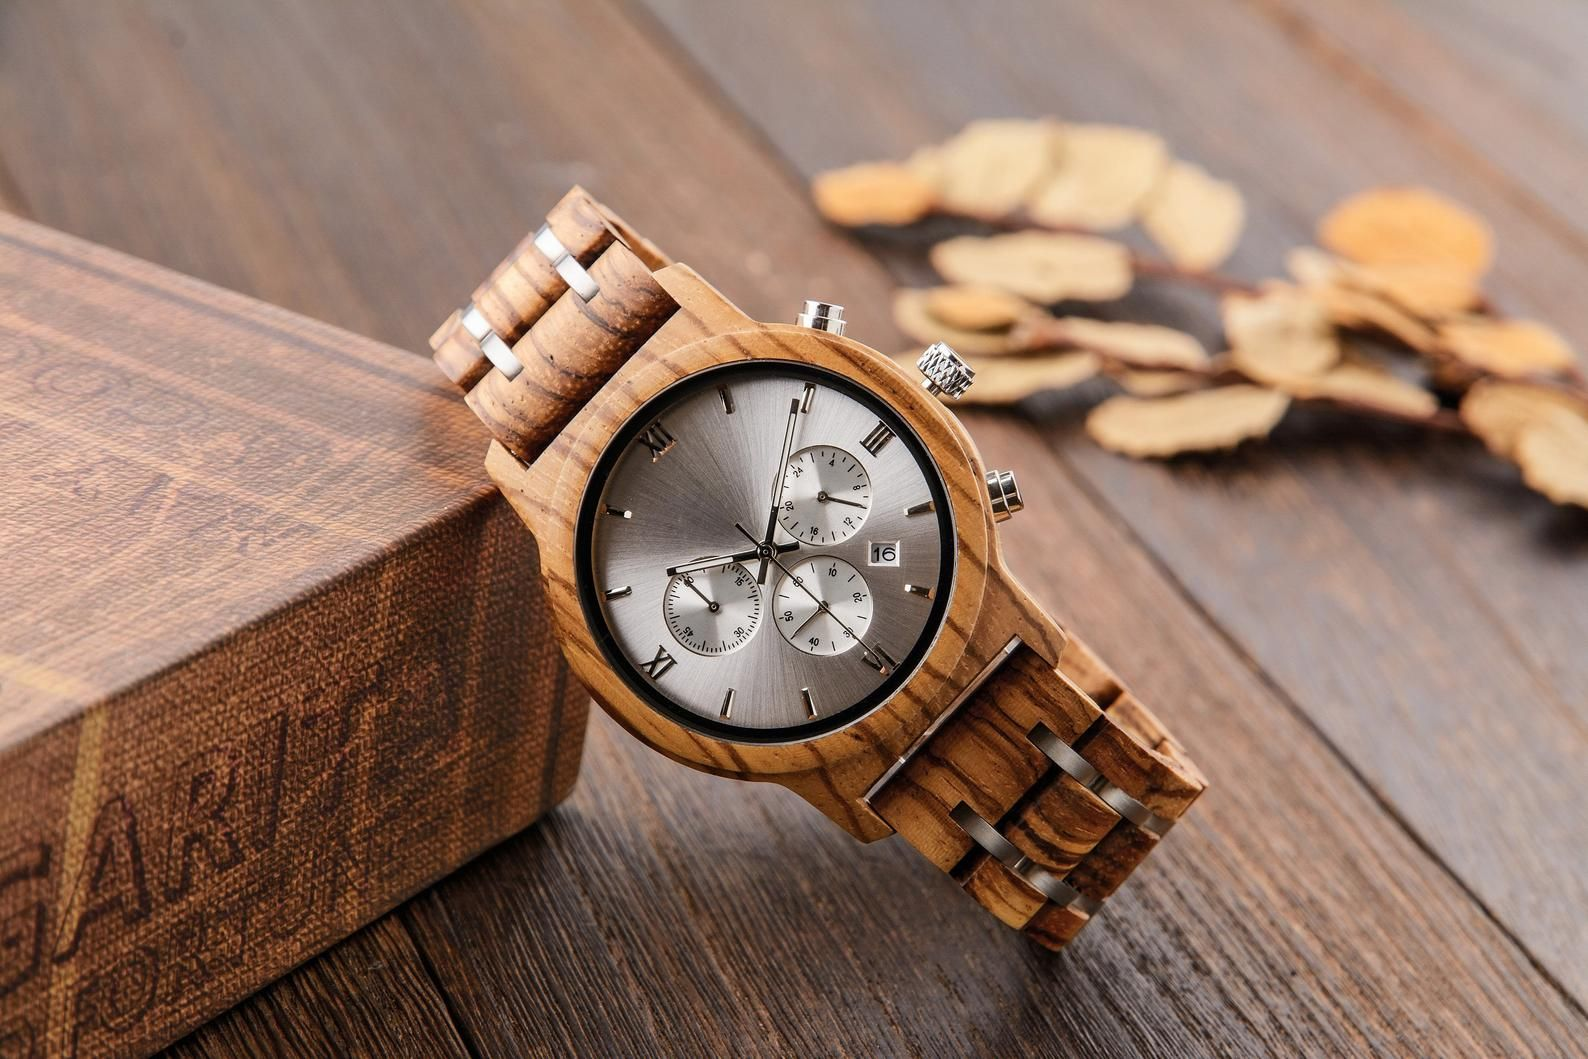 Custom Watch For Men Engraved Watch Wood Watch Personalized Etsy Watch Engraving Custom Watch Watches For Men